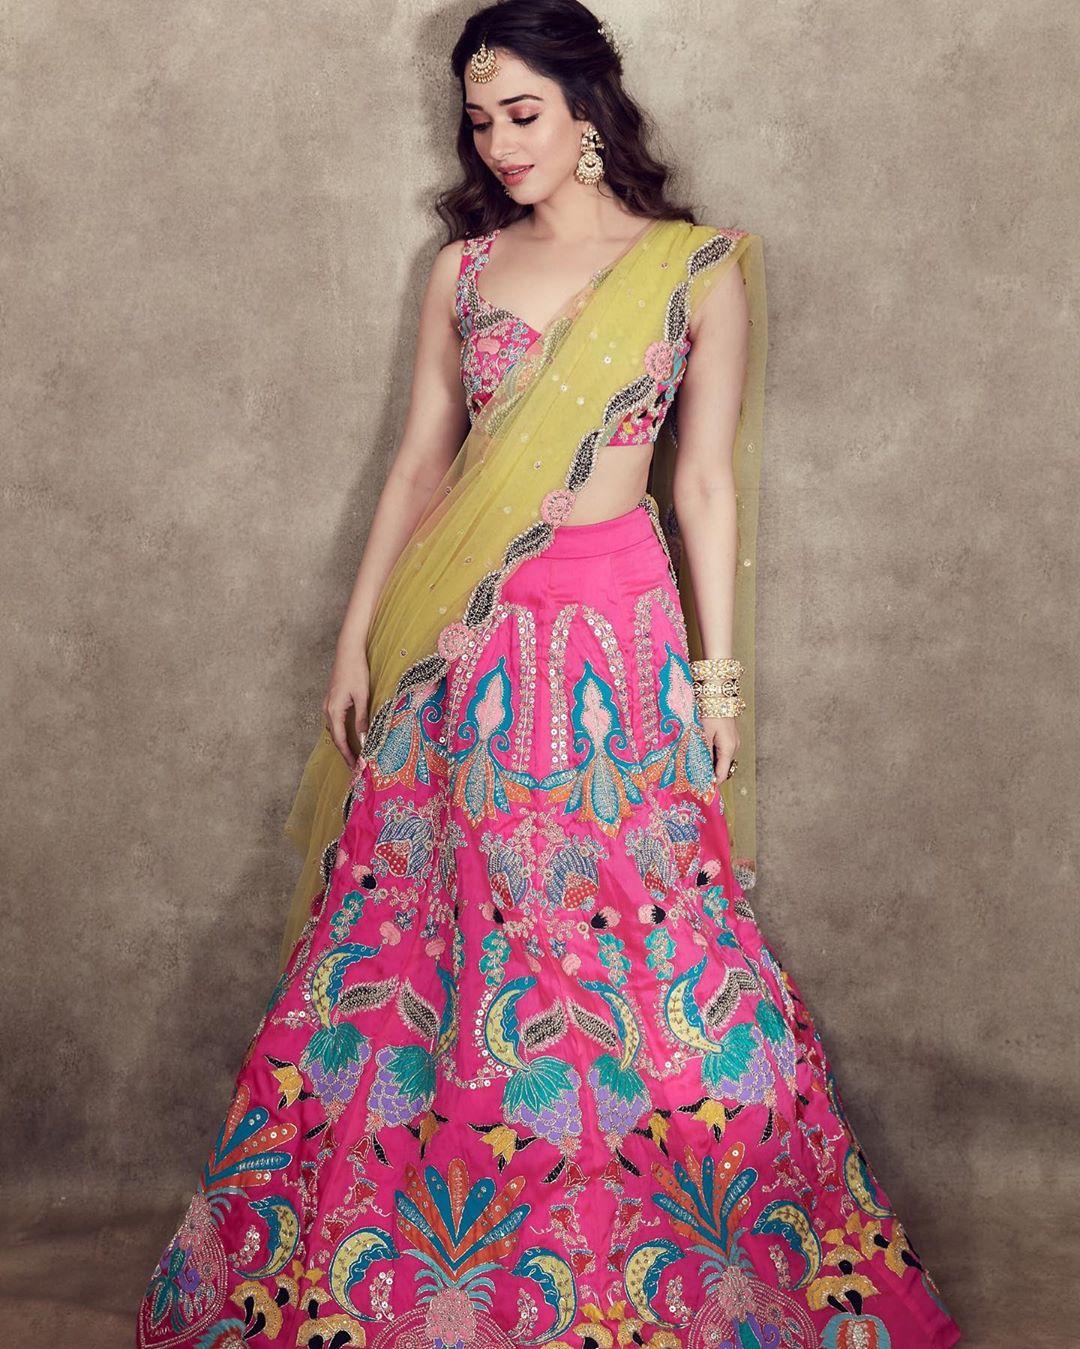 Tamannaah Bhaita in Pink Lehenga